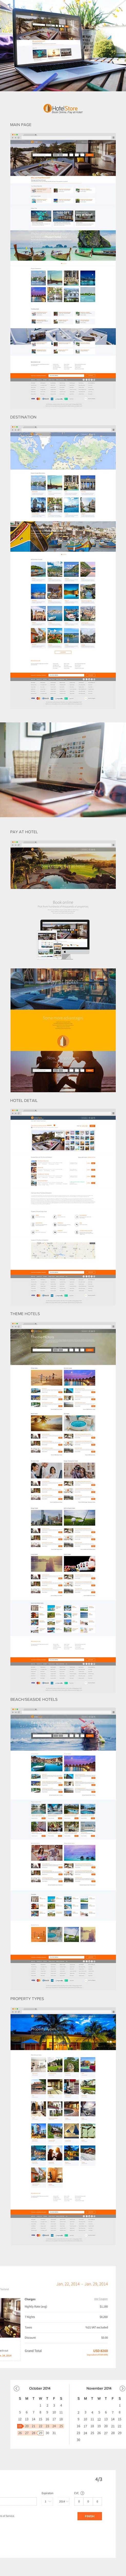 HotelStore.com on Behance Hotel Store Website | #webdesign #web #design #layout #userinterface  #website #web #internet #site #webdesigner #designer #ui #ux #responsive #ResponsiveDesign #brand  #creative